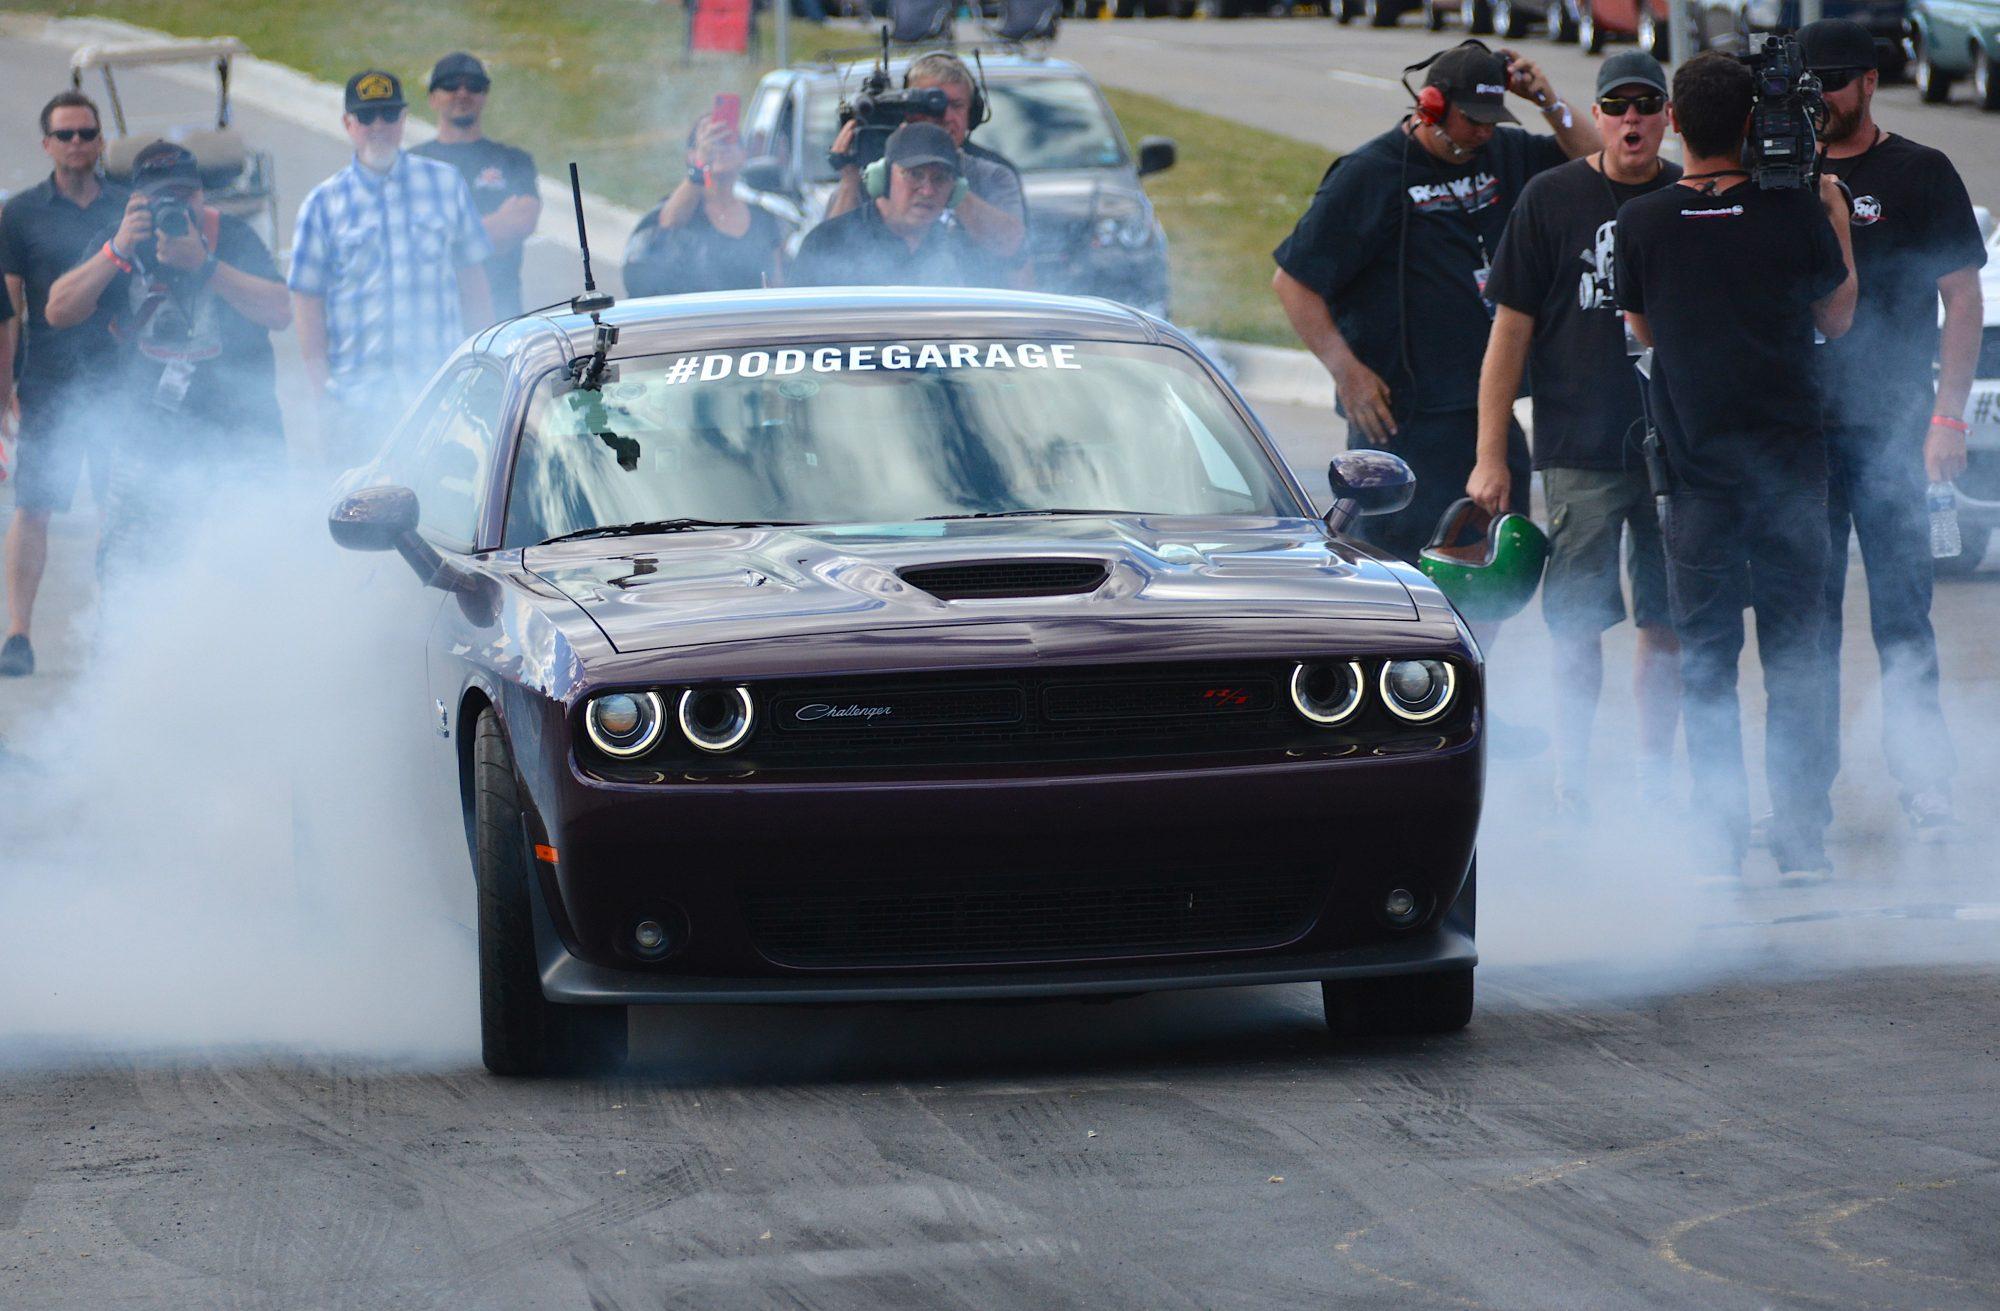 Challenger doing a burnout